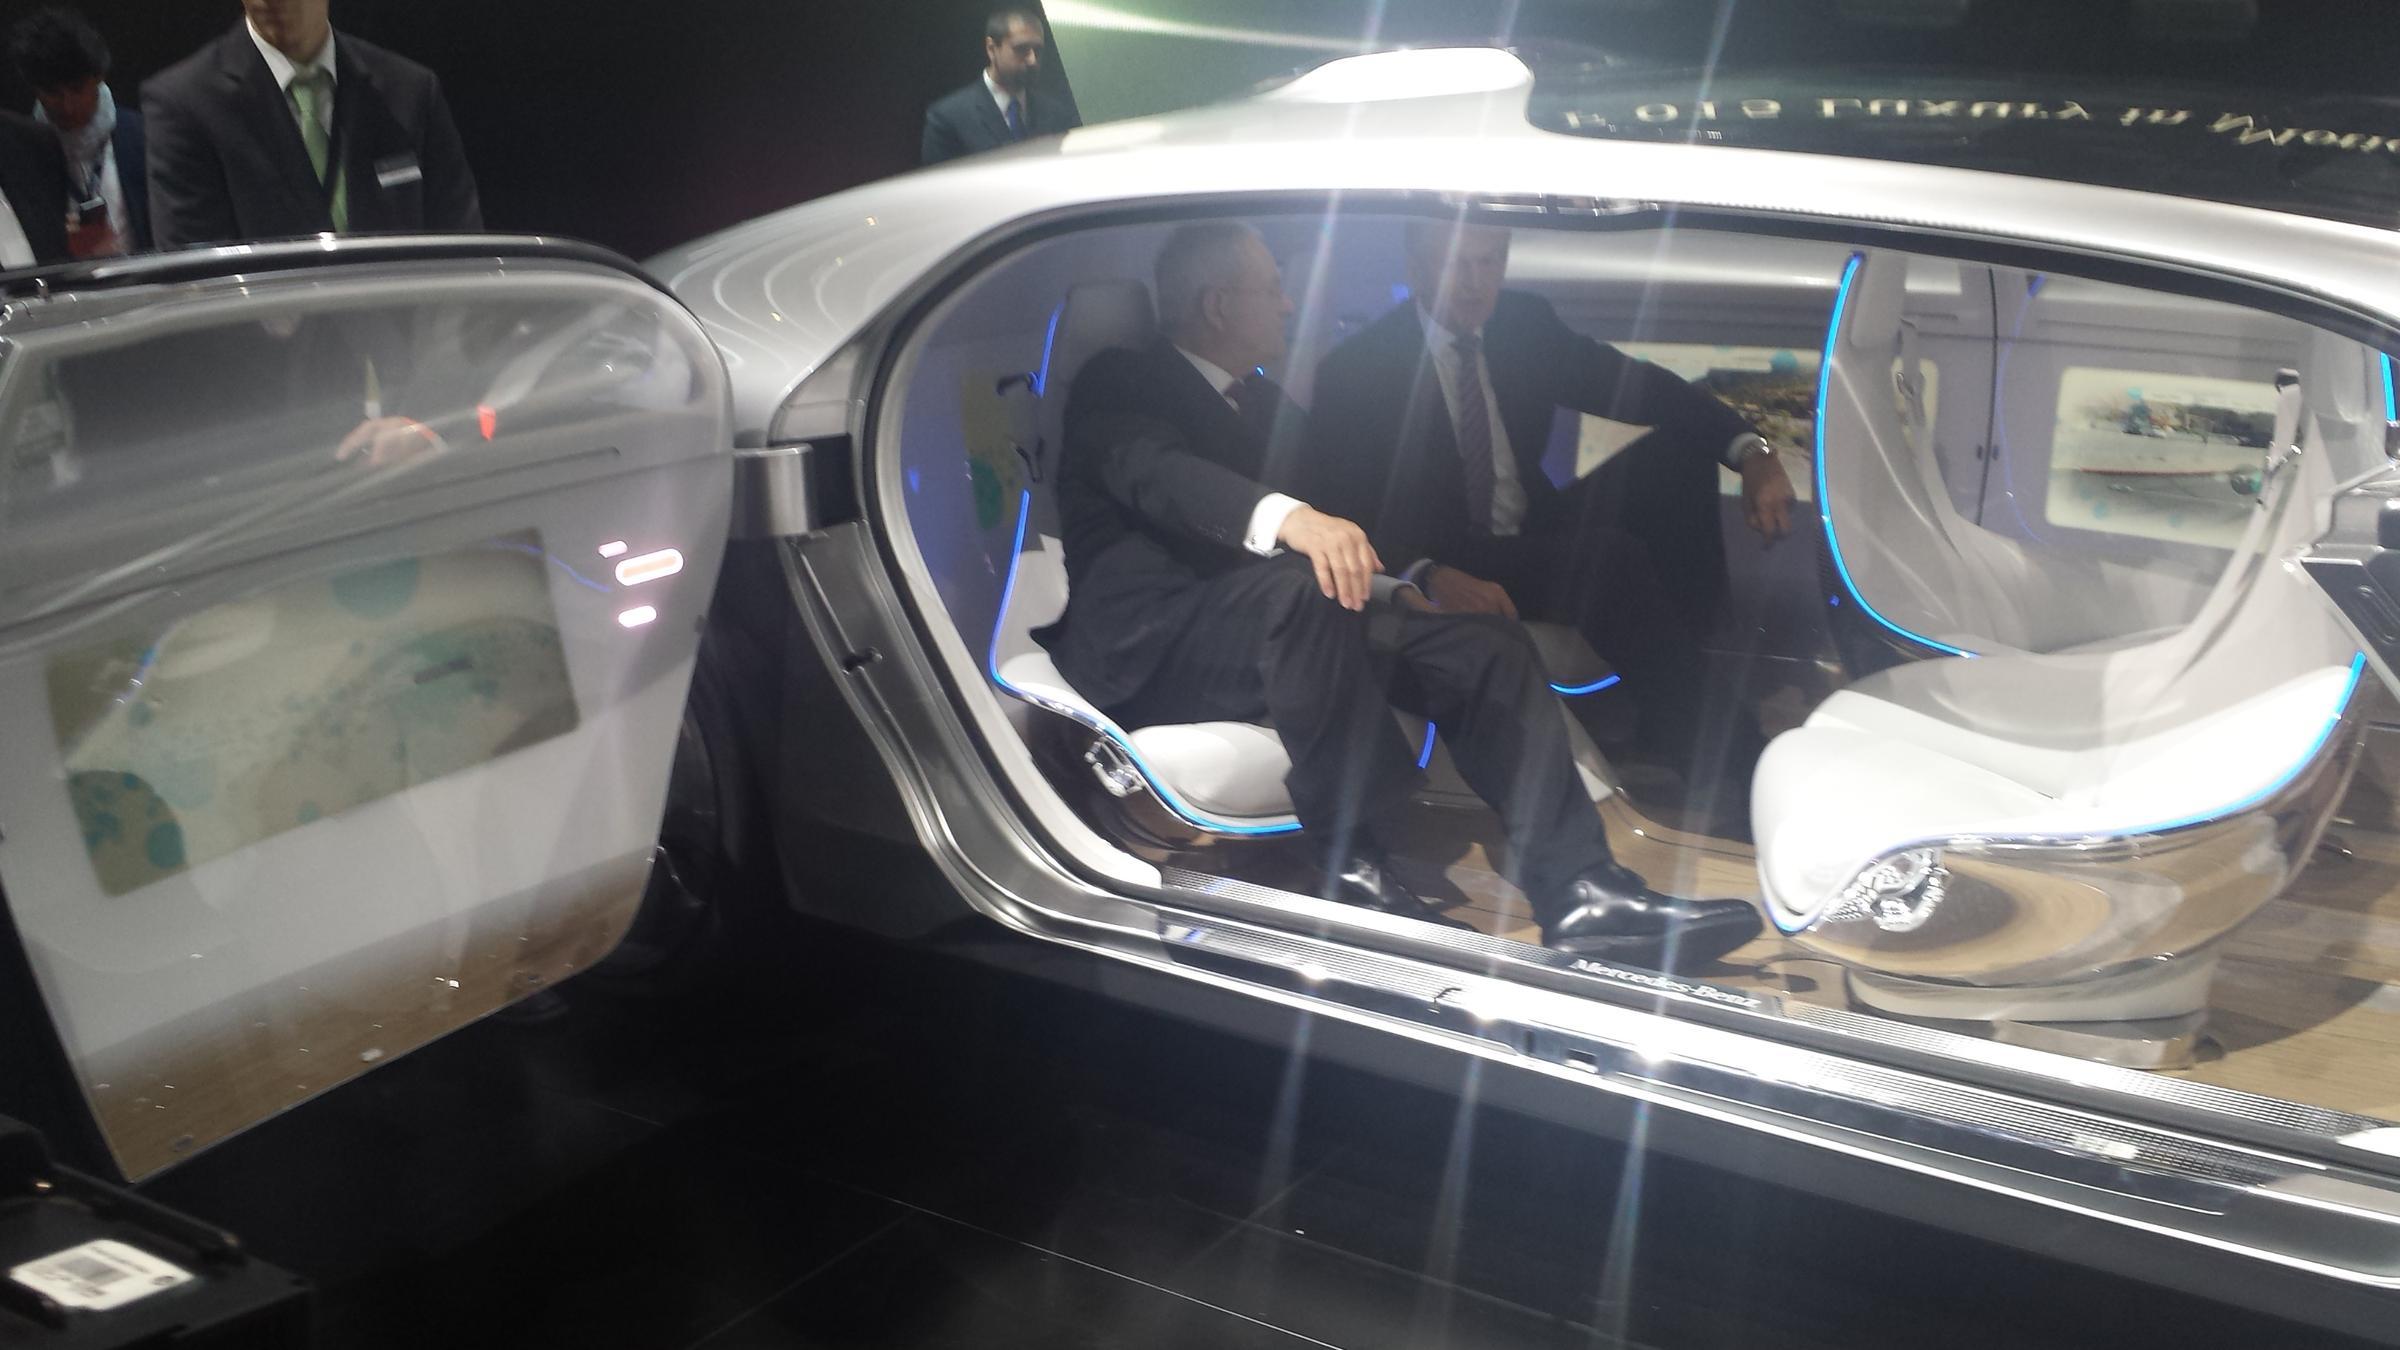 Car Driving Itself Best Cars Modified Dur A Flex - Audi car that drives itself